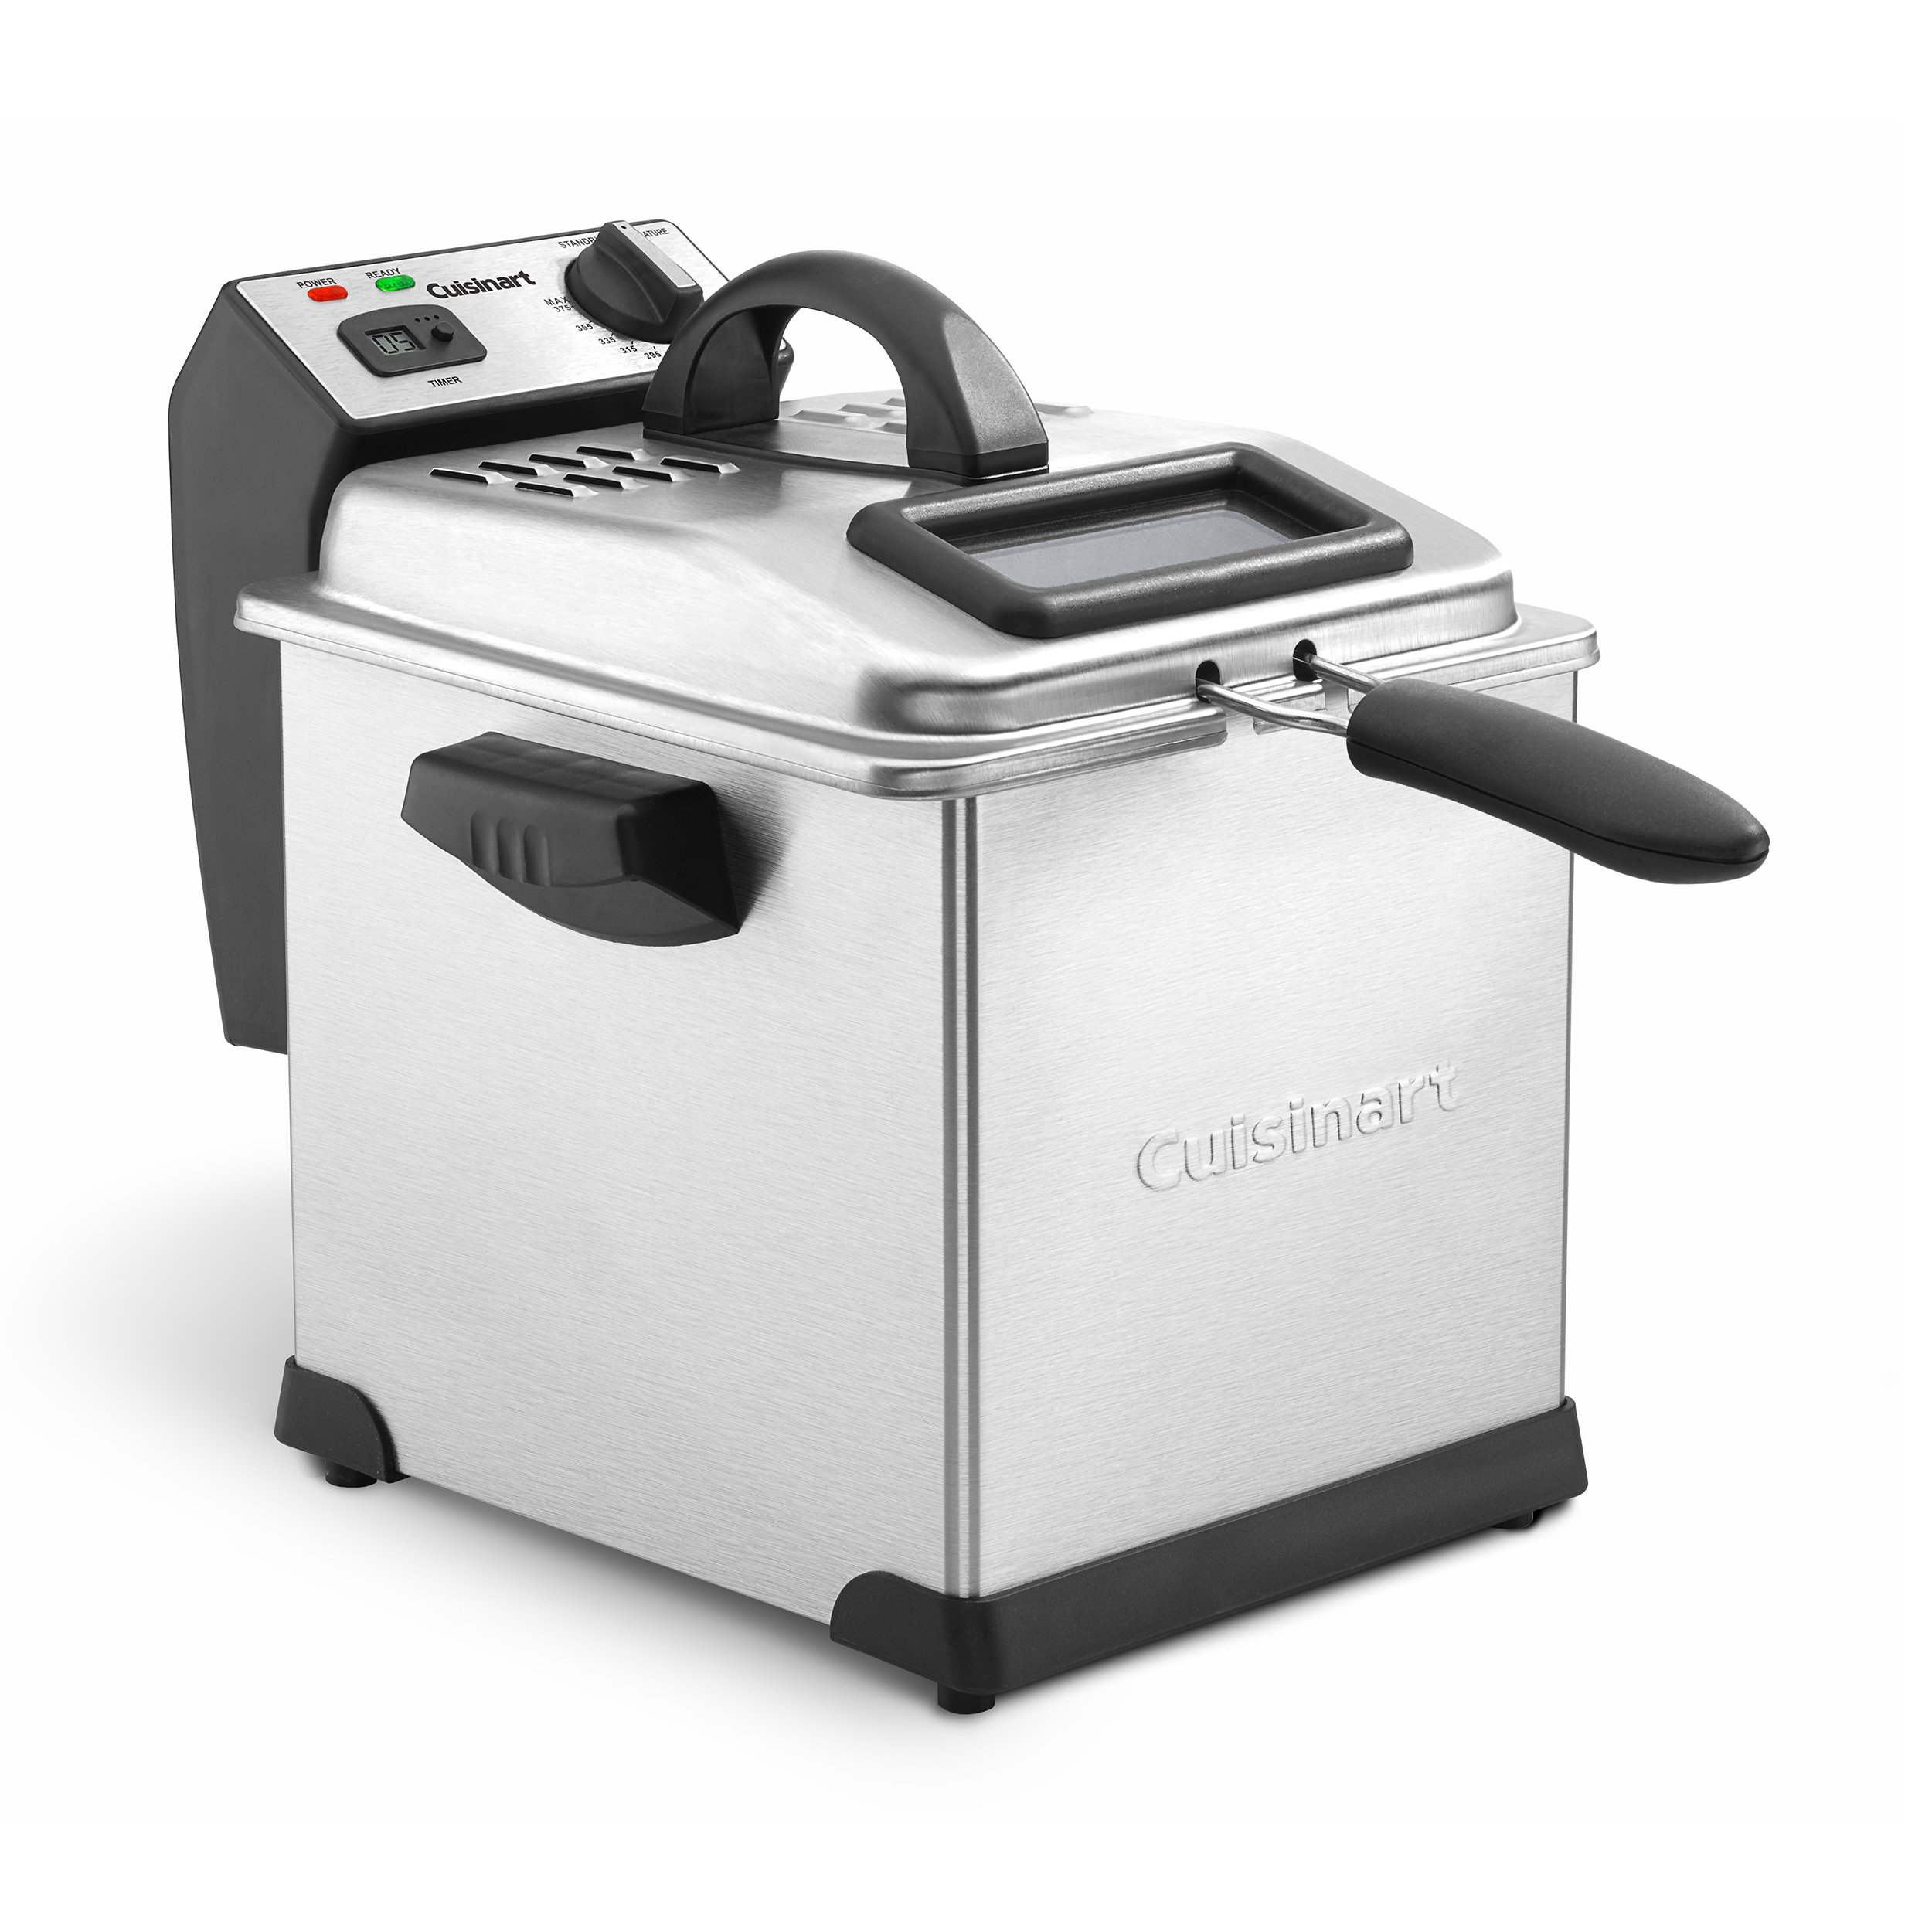 Cuisinart CDF 170 Fryer quart Stainless